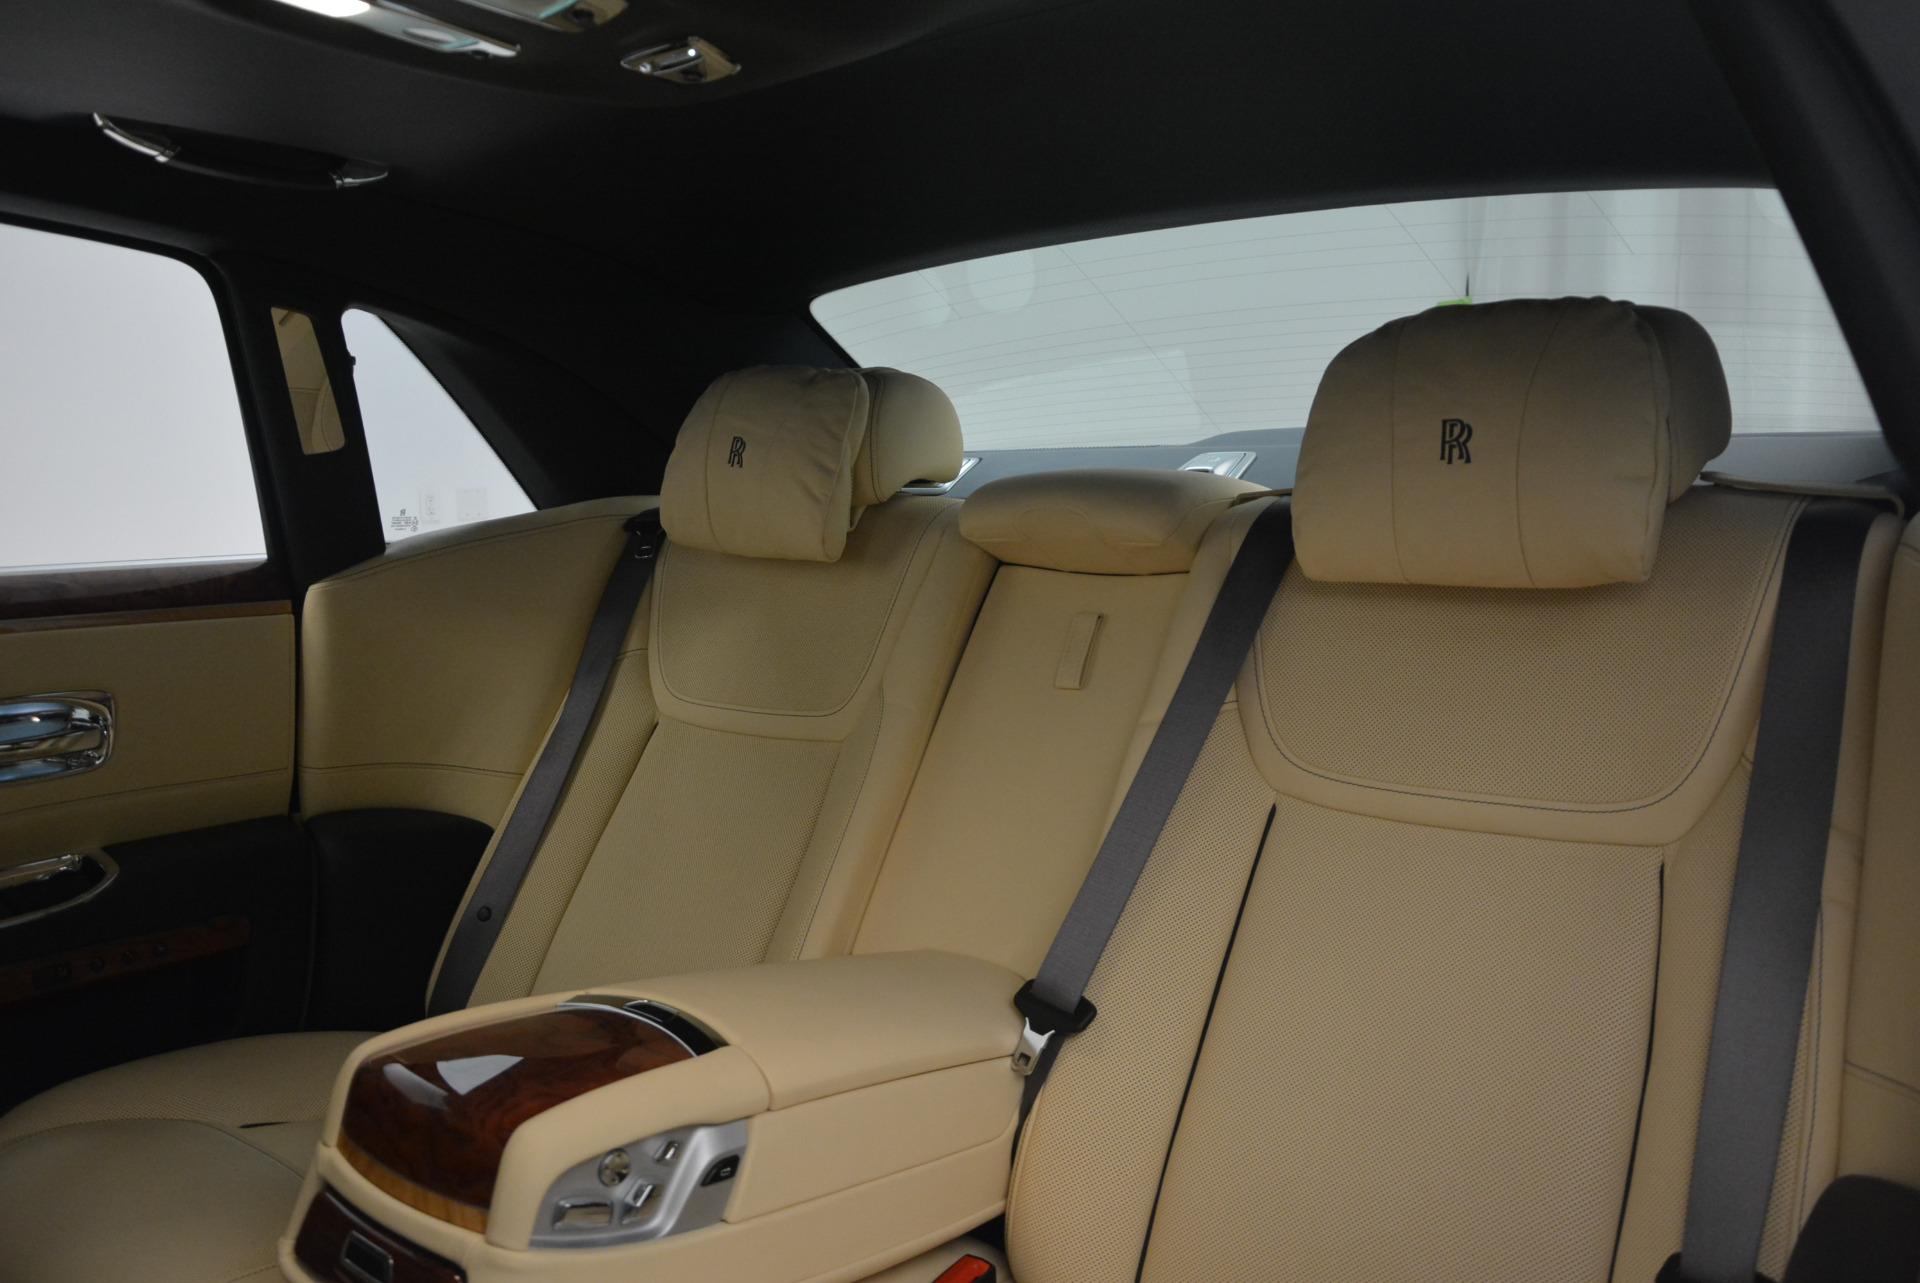 Used 2016 Rolls-Royce Ghost EWB For Sale In Greenwich, CT 746_p29